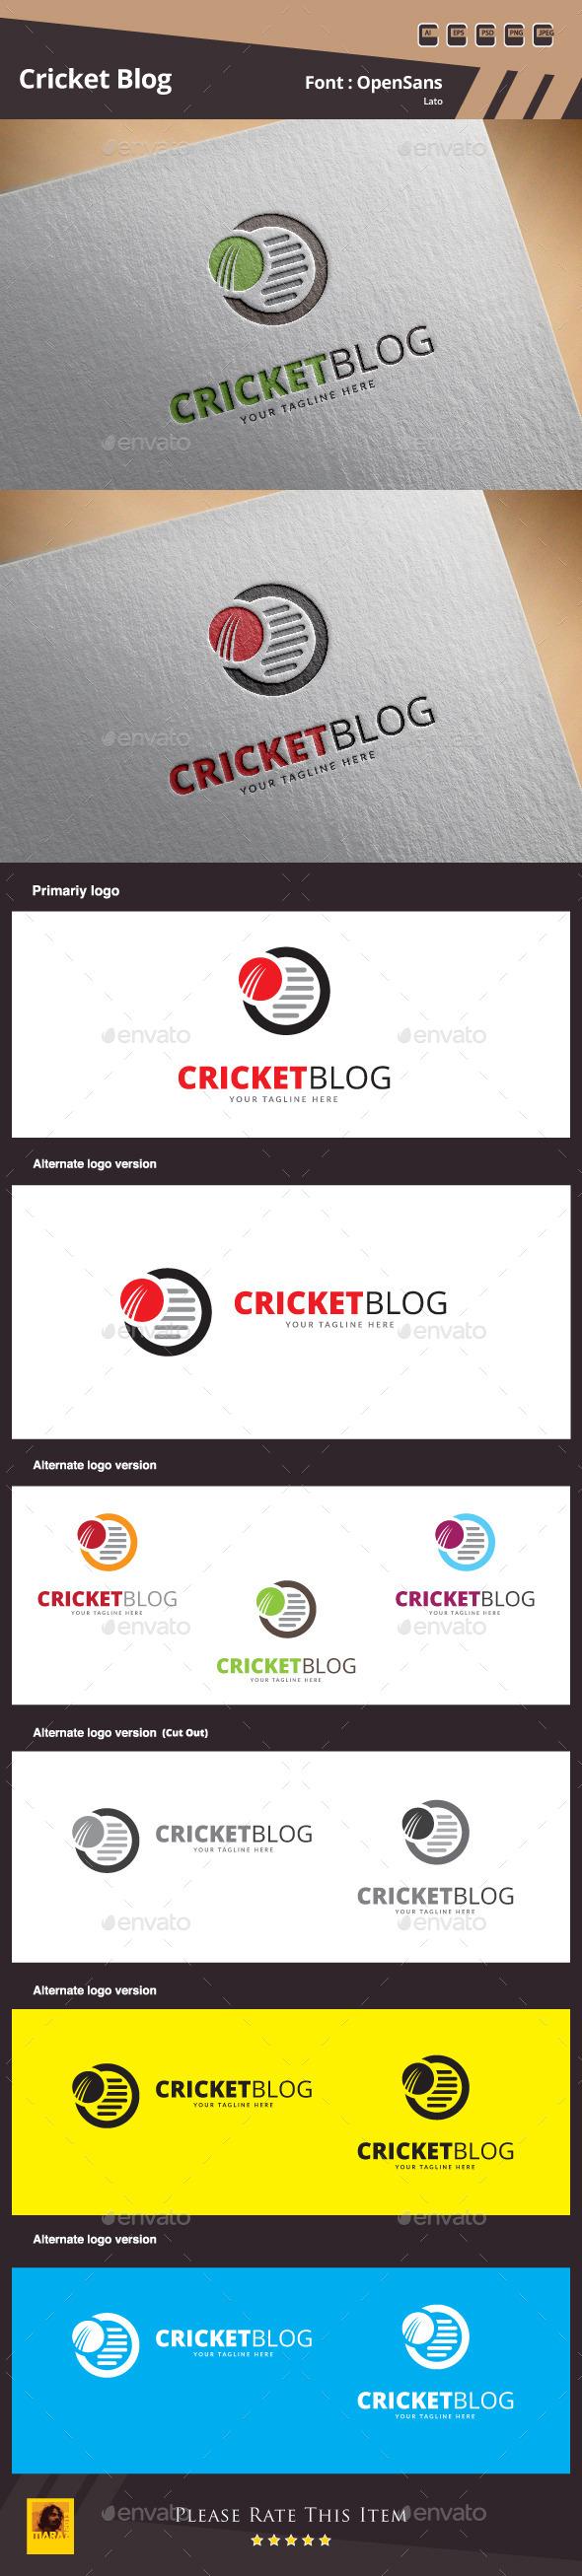 GraphicRiver Cricket Blog Logo Template 10318709